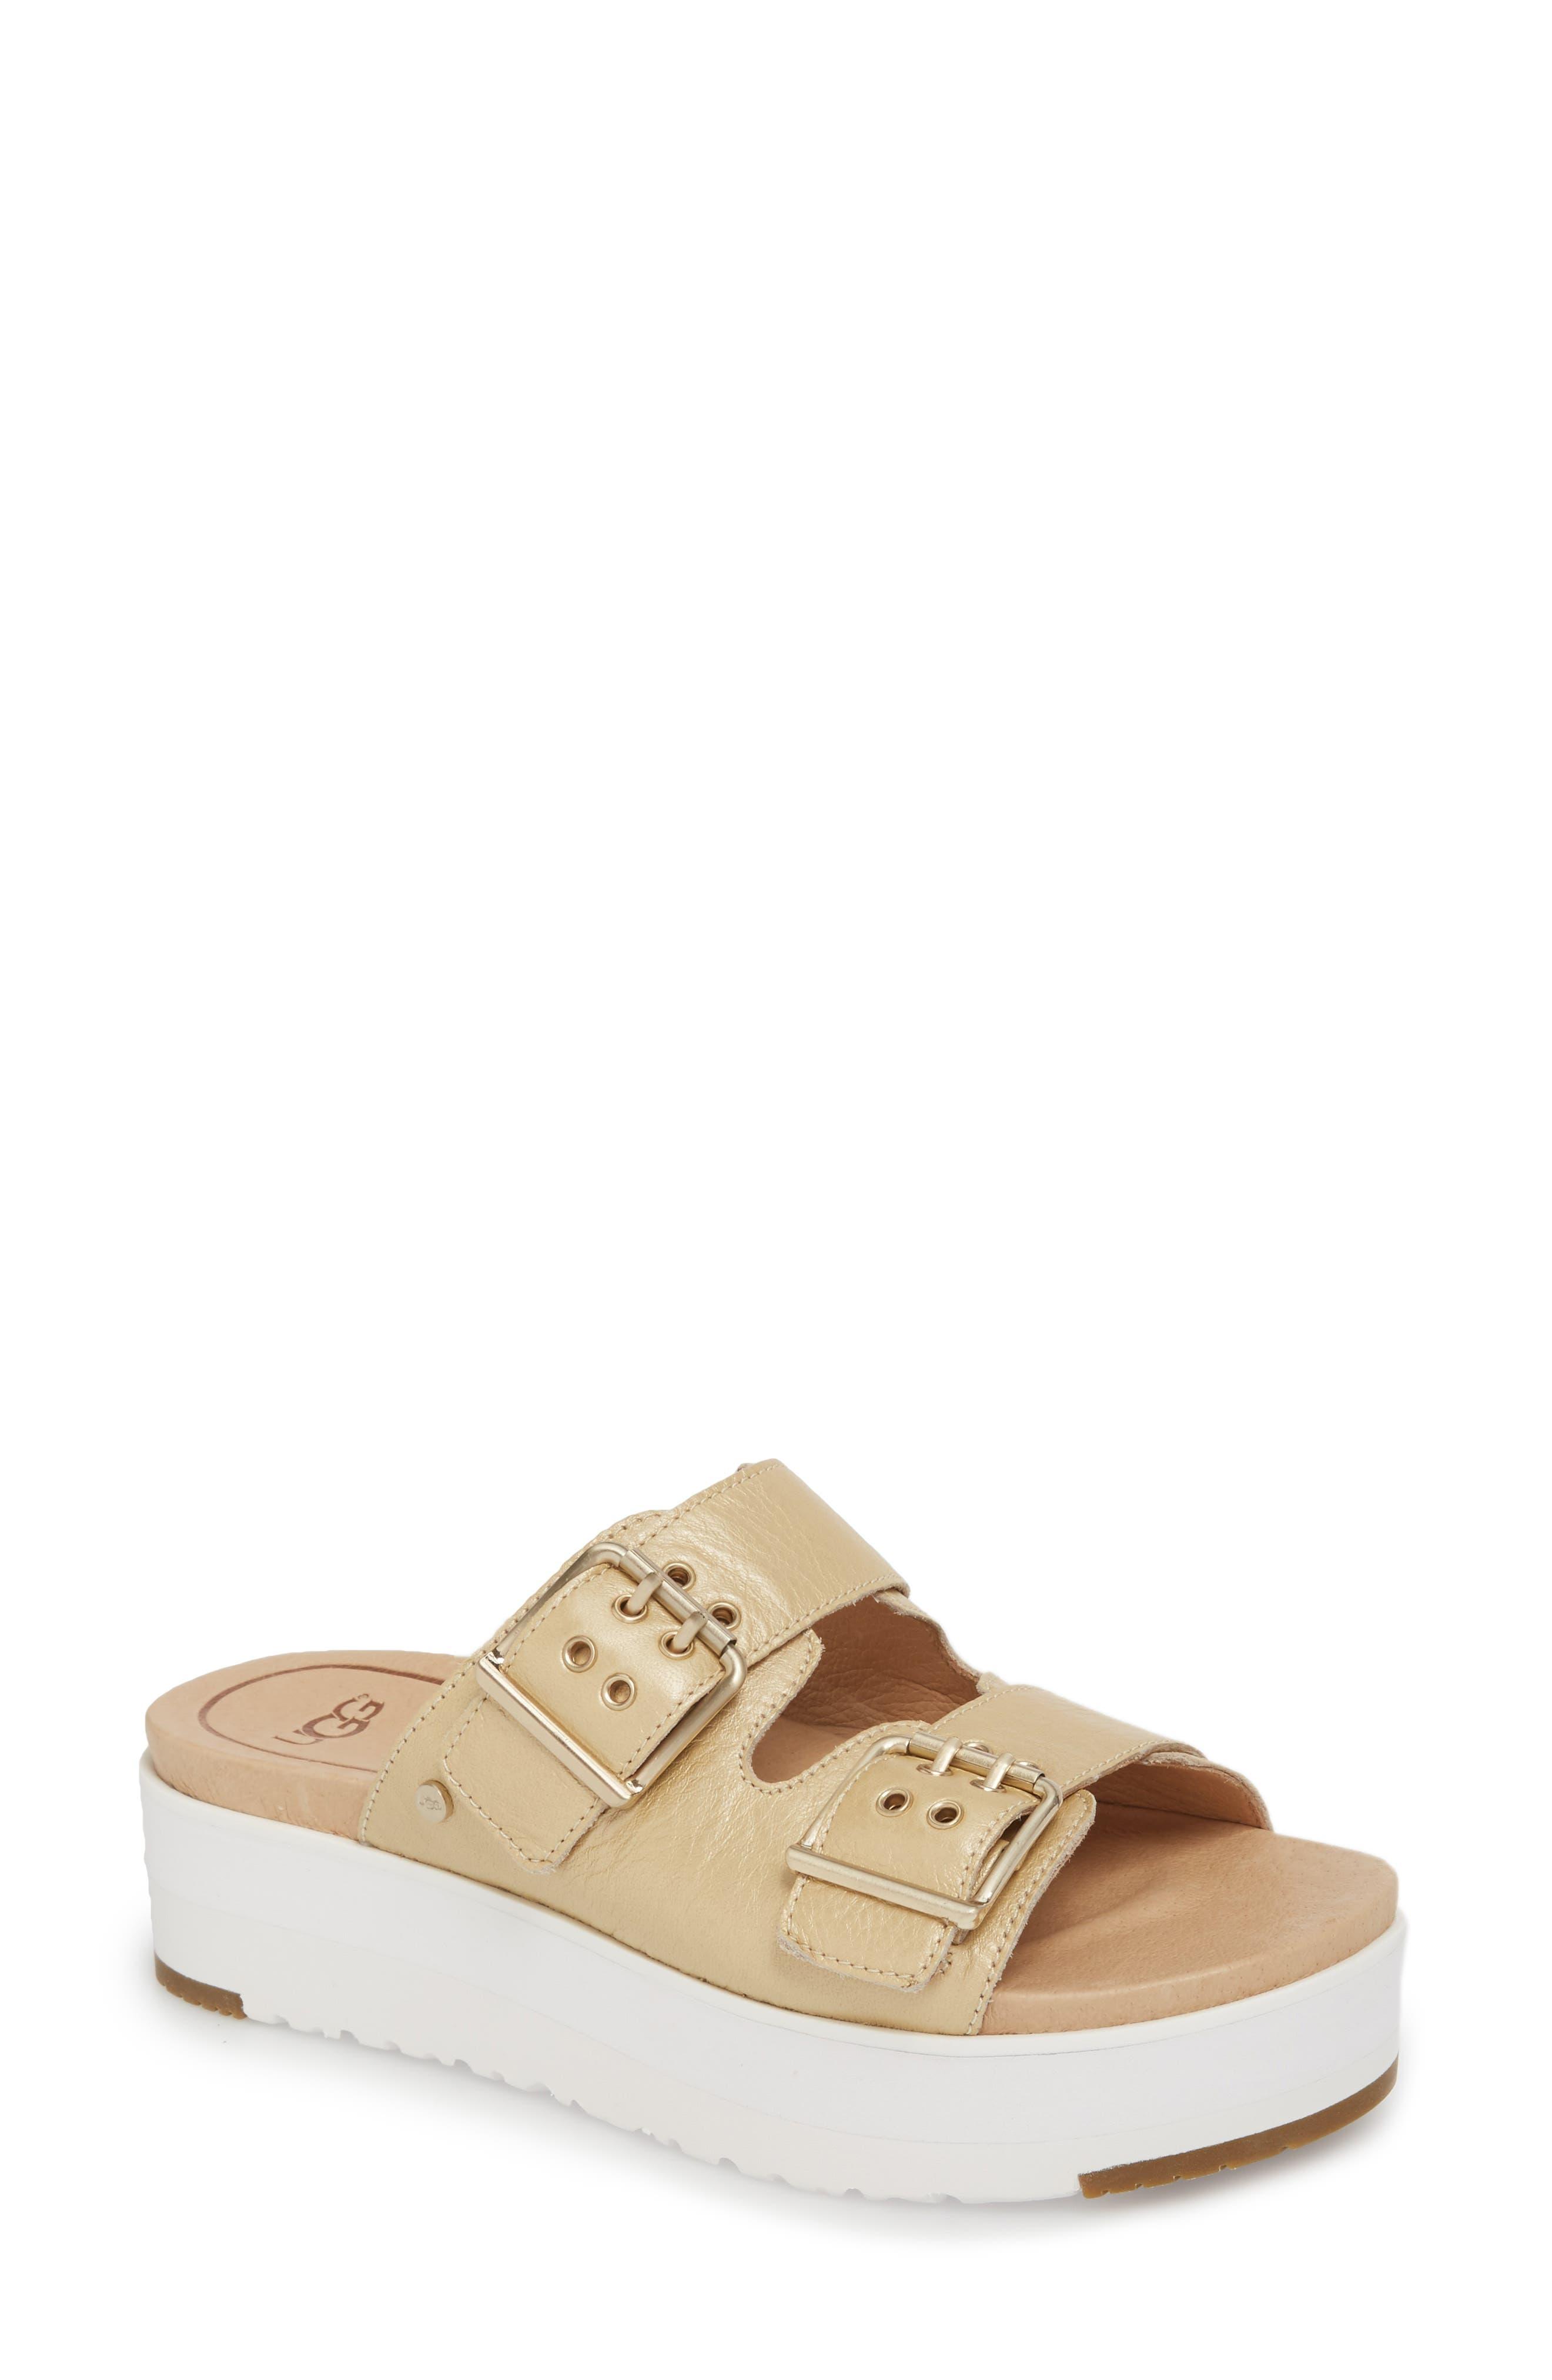 Cammie Platform Sandal,                             Main thumbnail 1, color,                             Gold Patent Leather